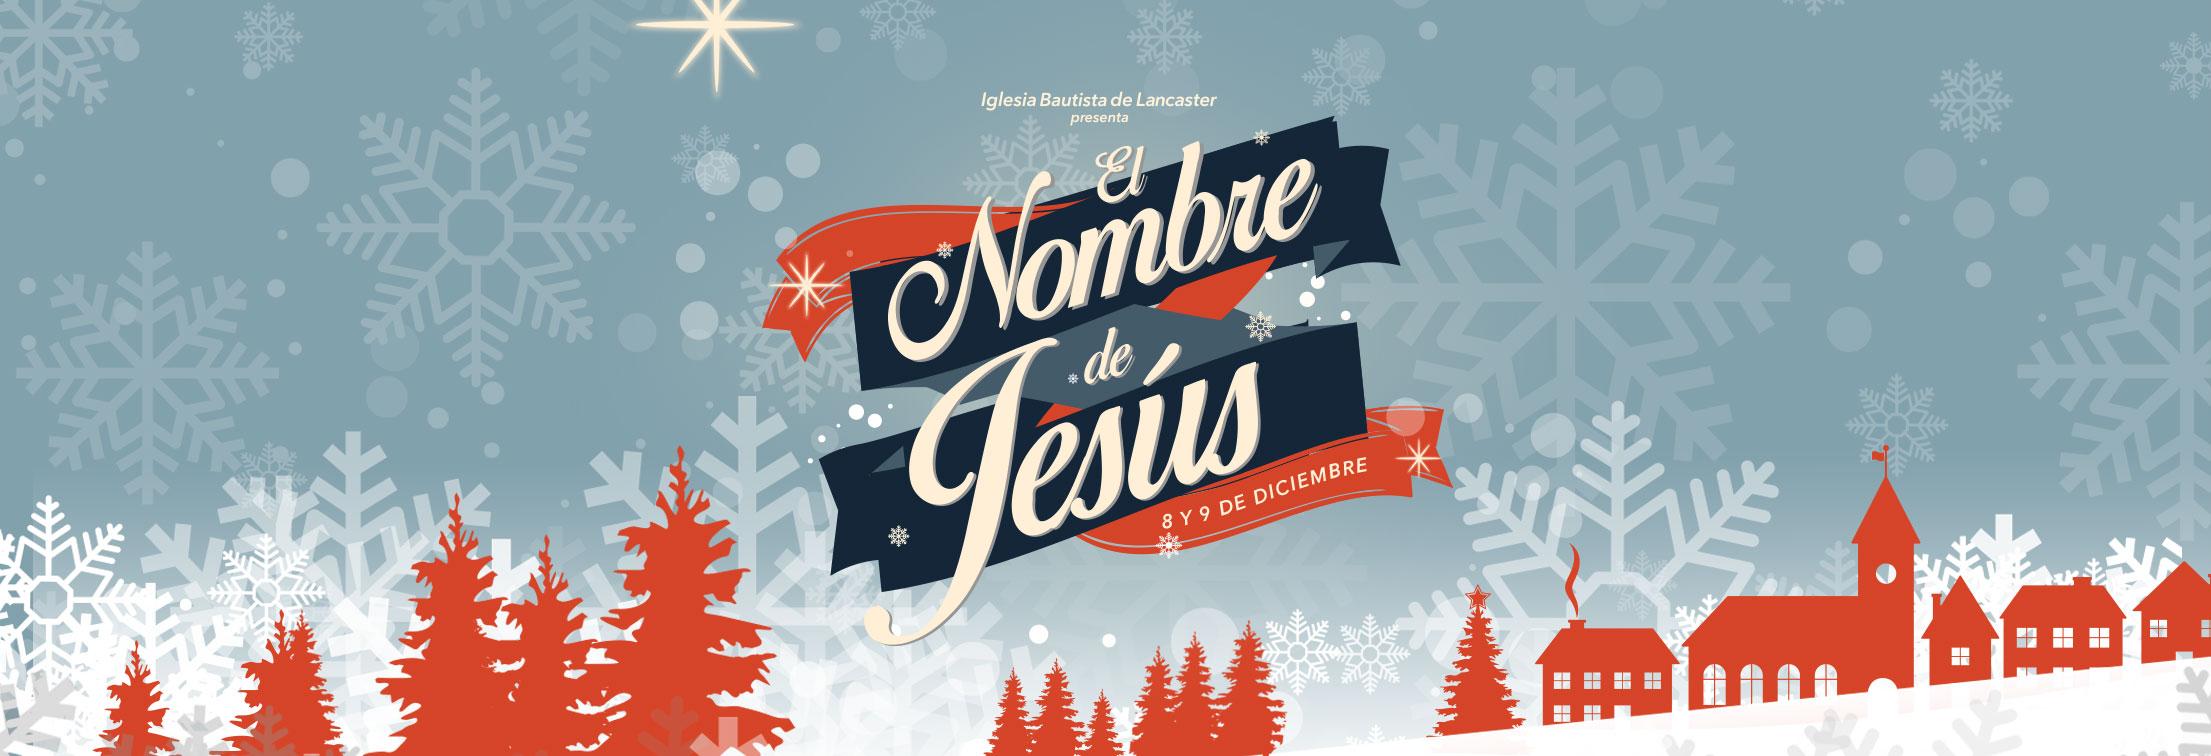 El-Nombre-de-Jesús-BG-WEB.jpg